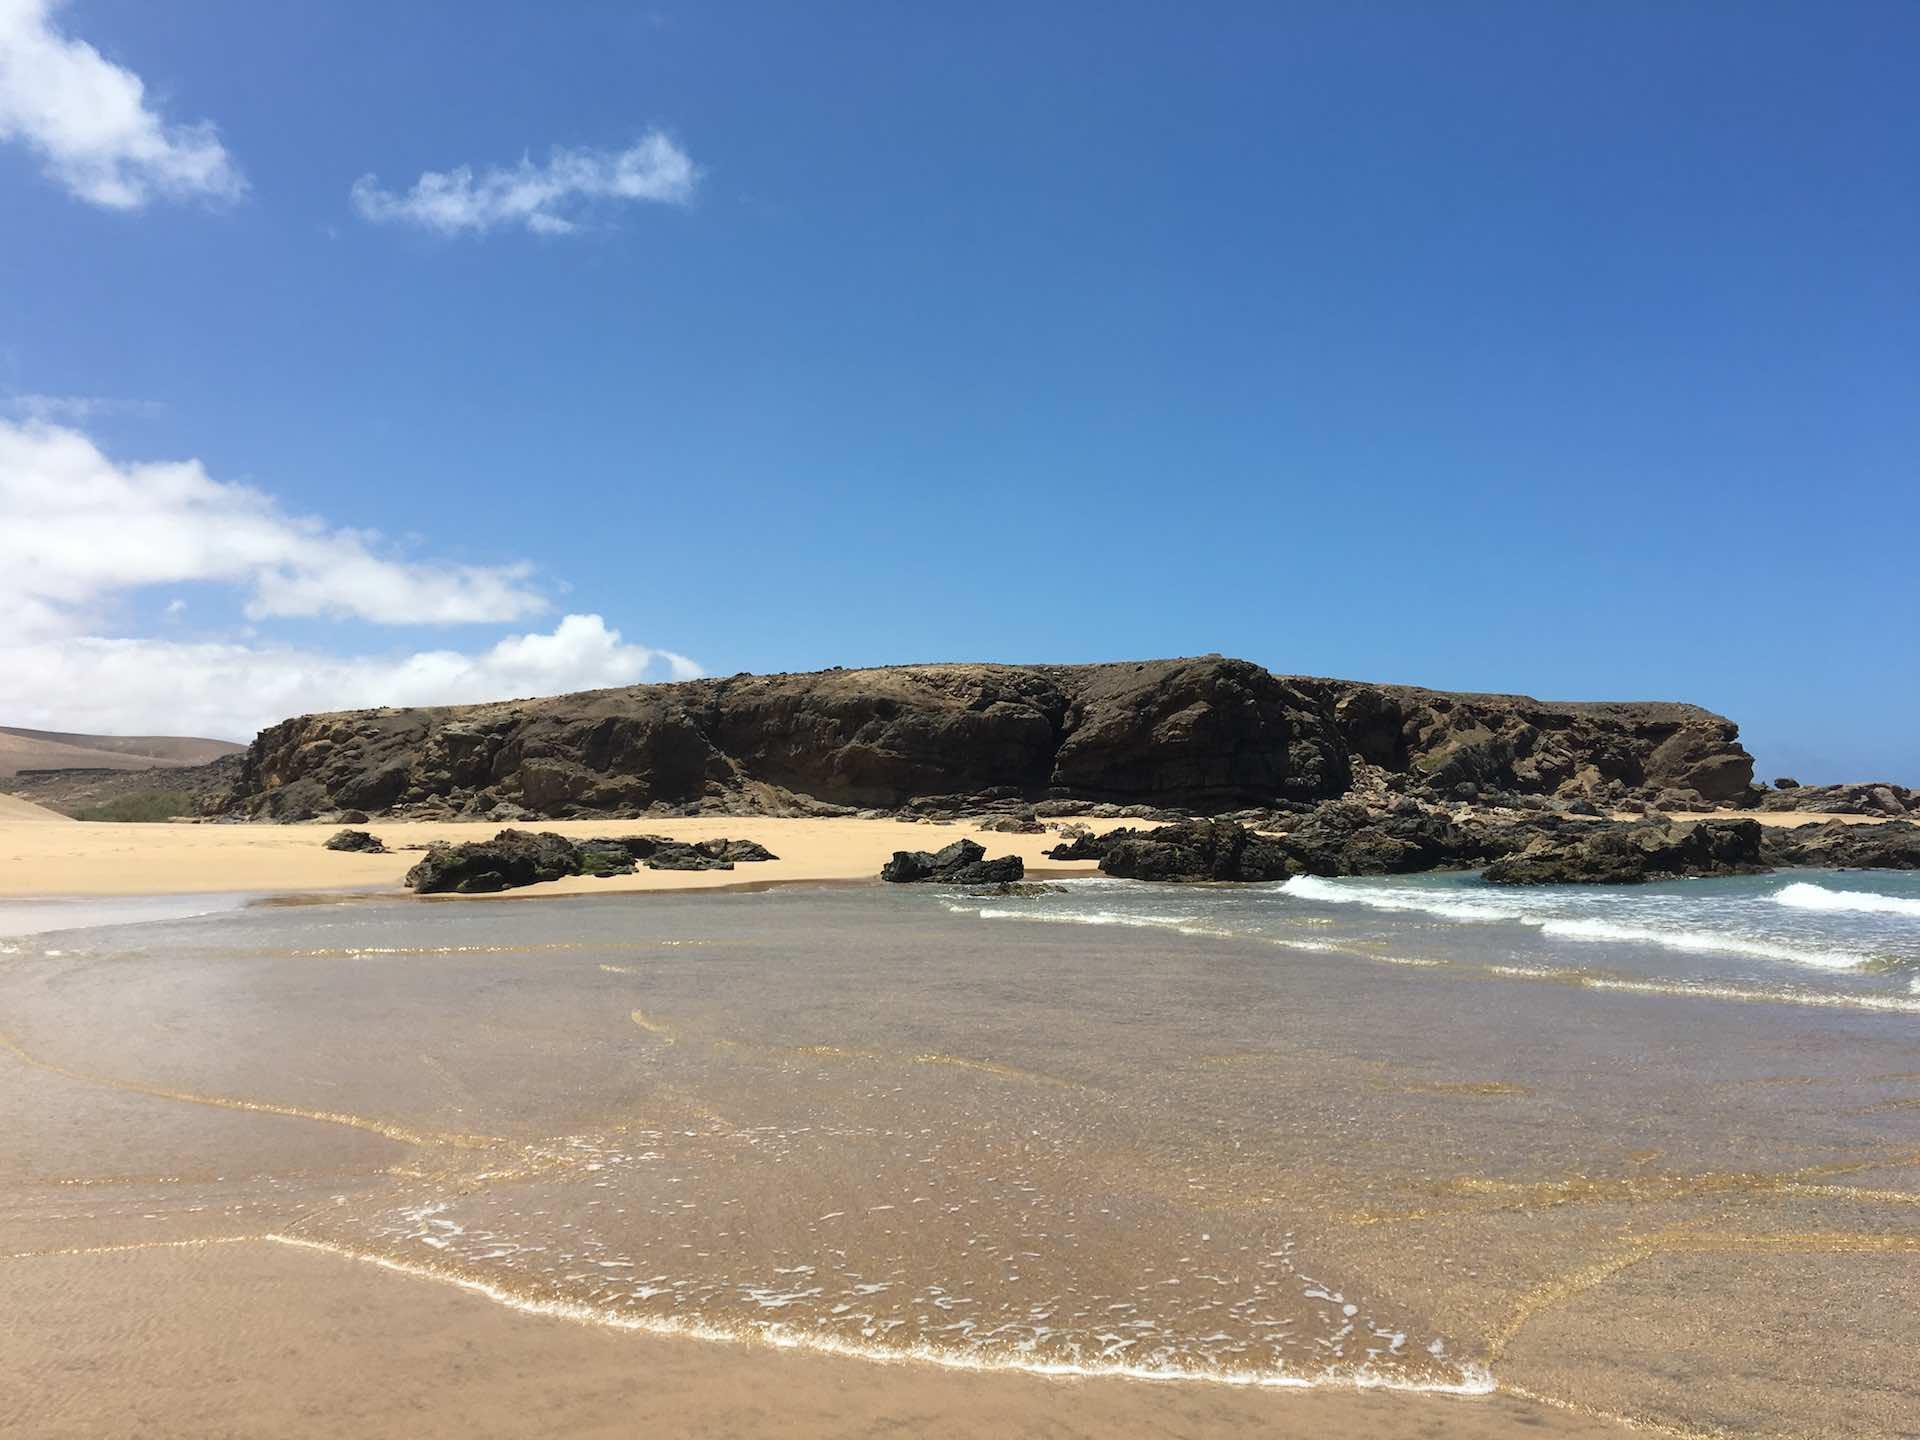 Playa Janubio / Jarugo